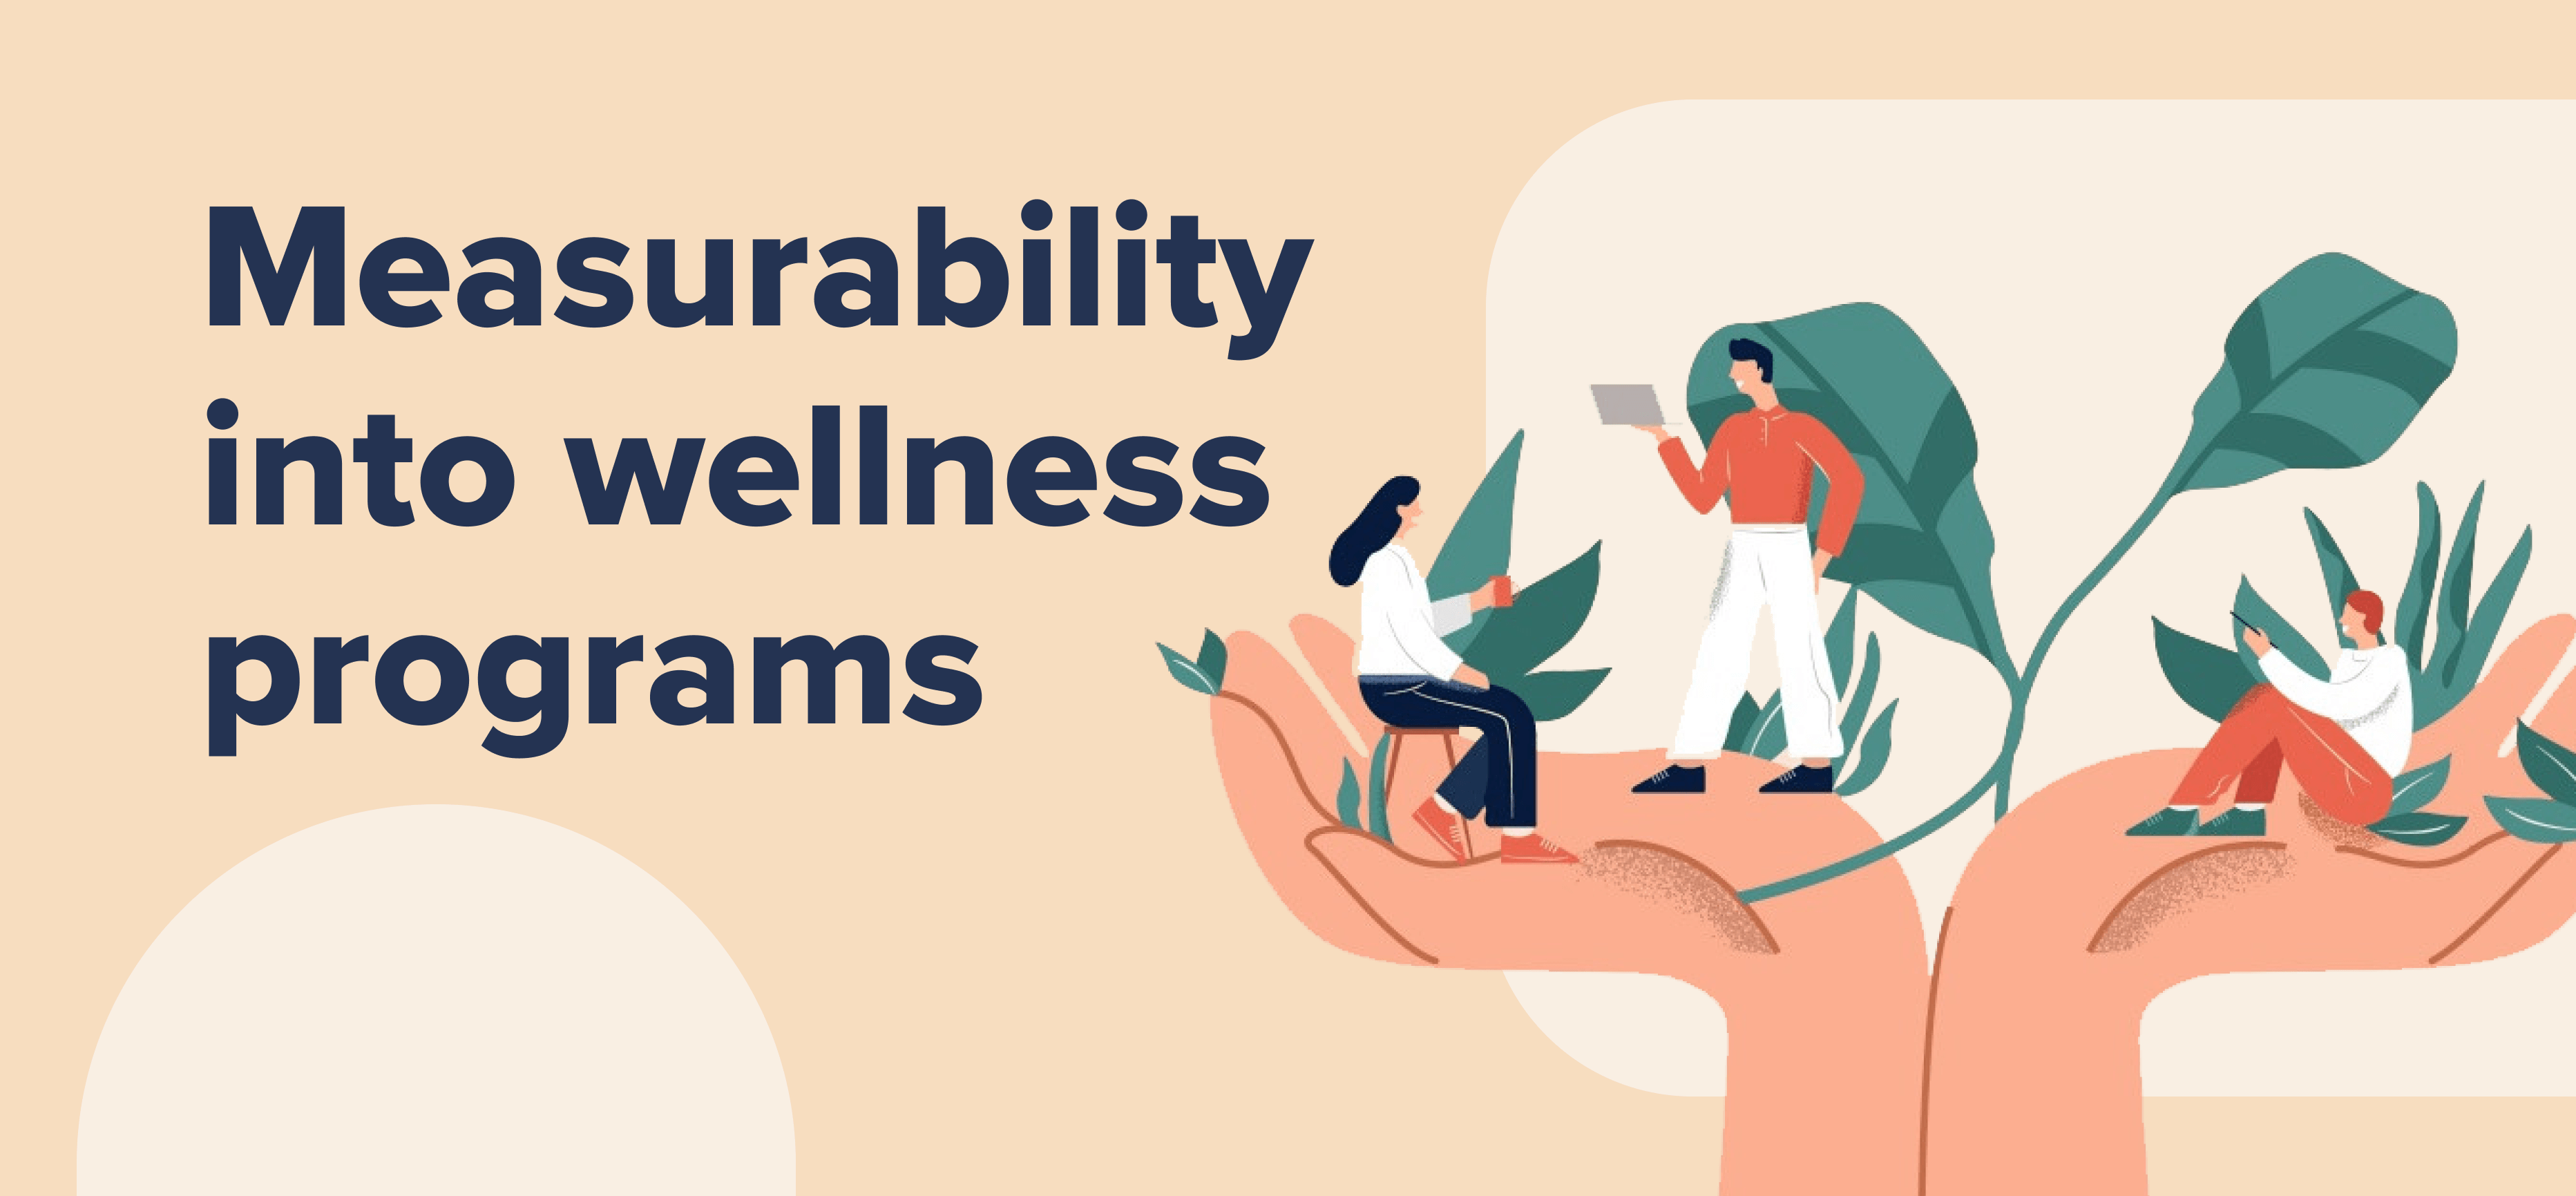 Getting Measurability into wellness programs